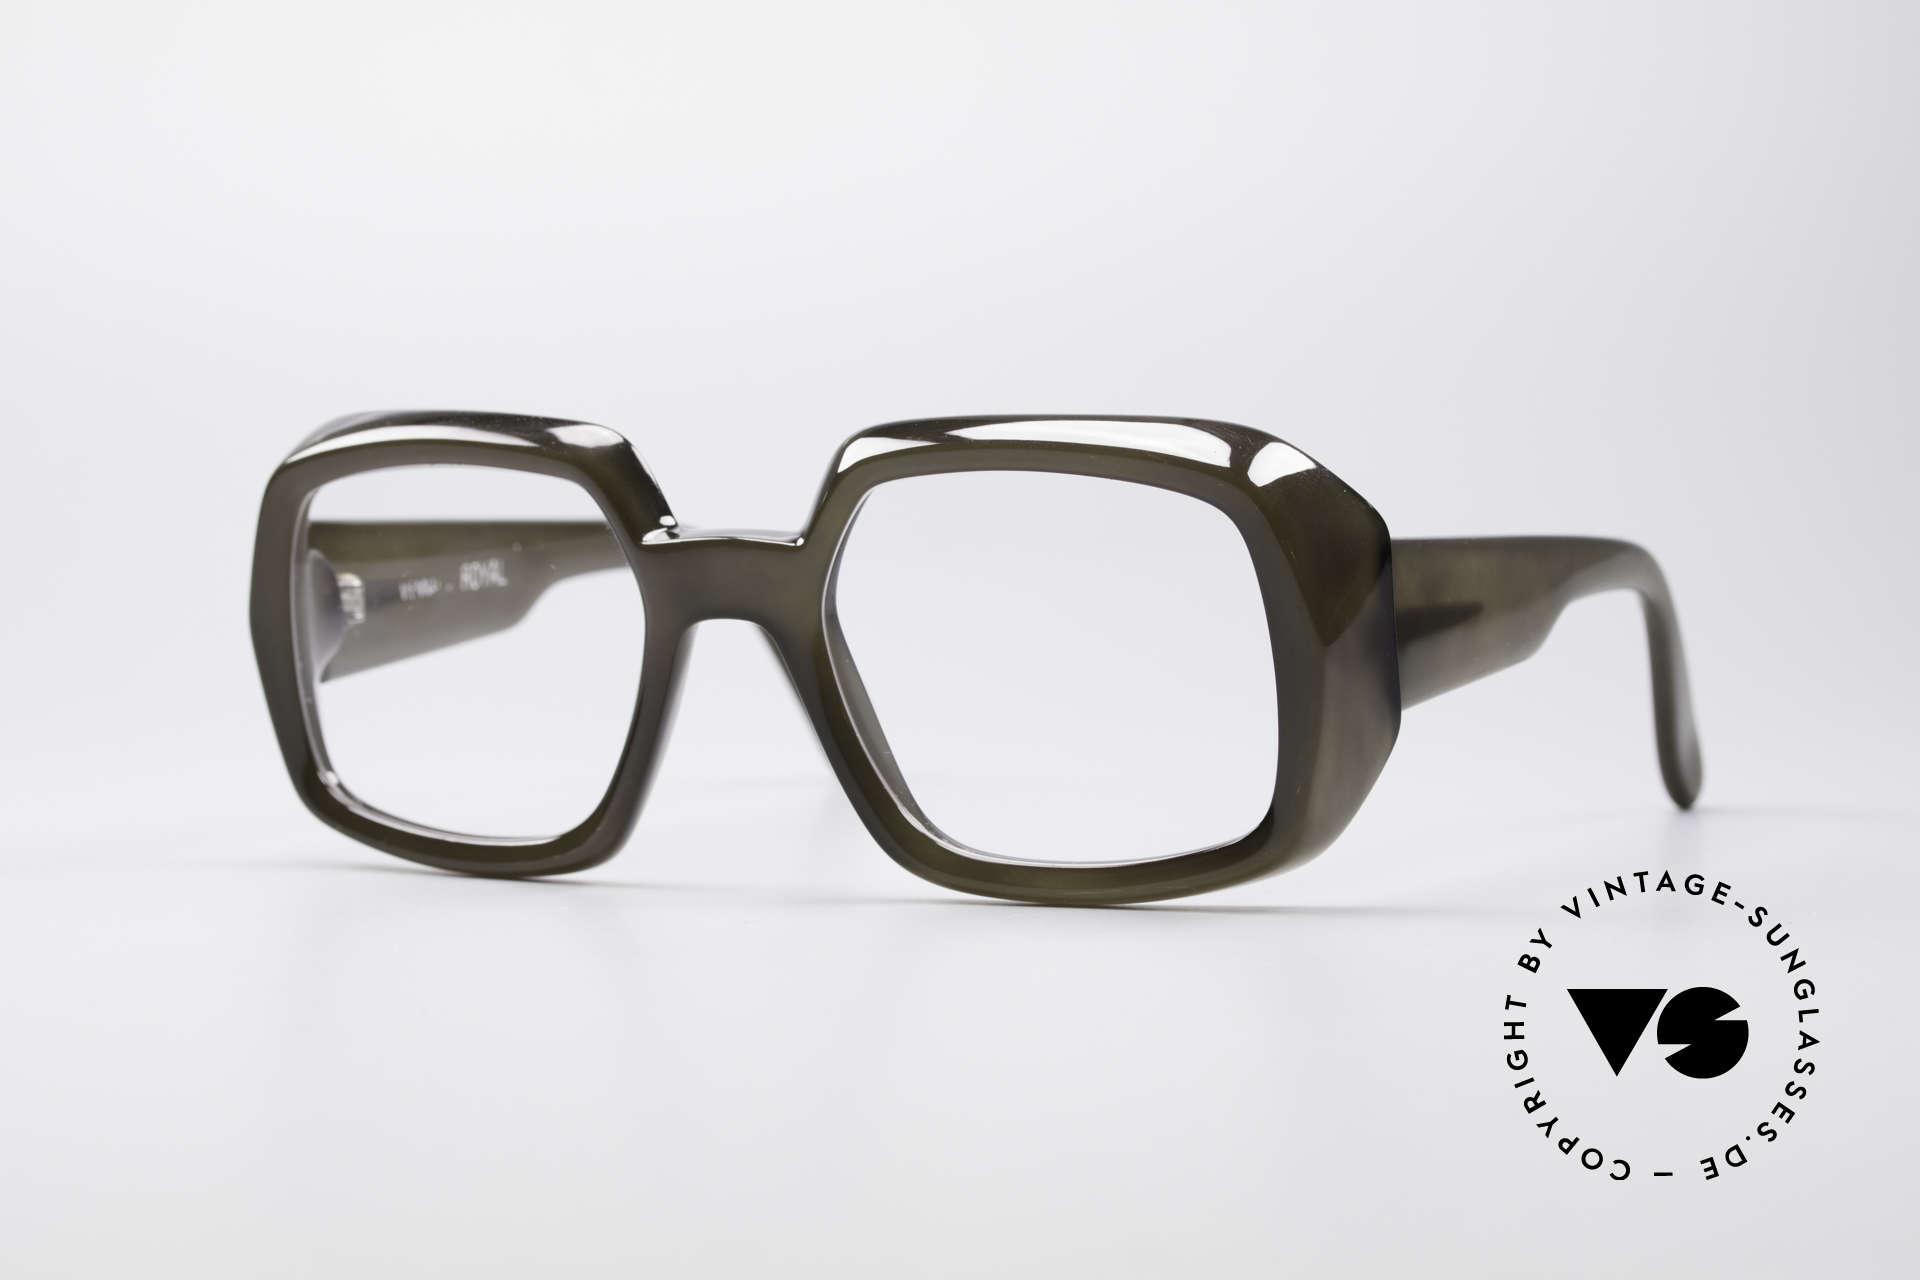 ViennaLine Royal 1601 Goliath Monster Specs, incredible vintage old school eyeglasses by ViennaLine, Made for Men